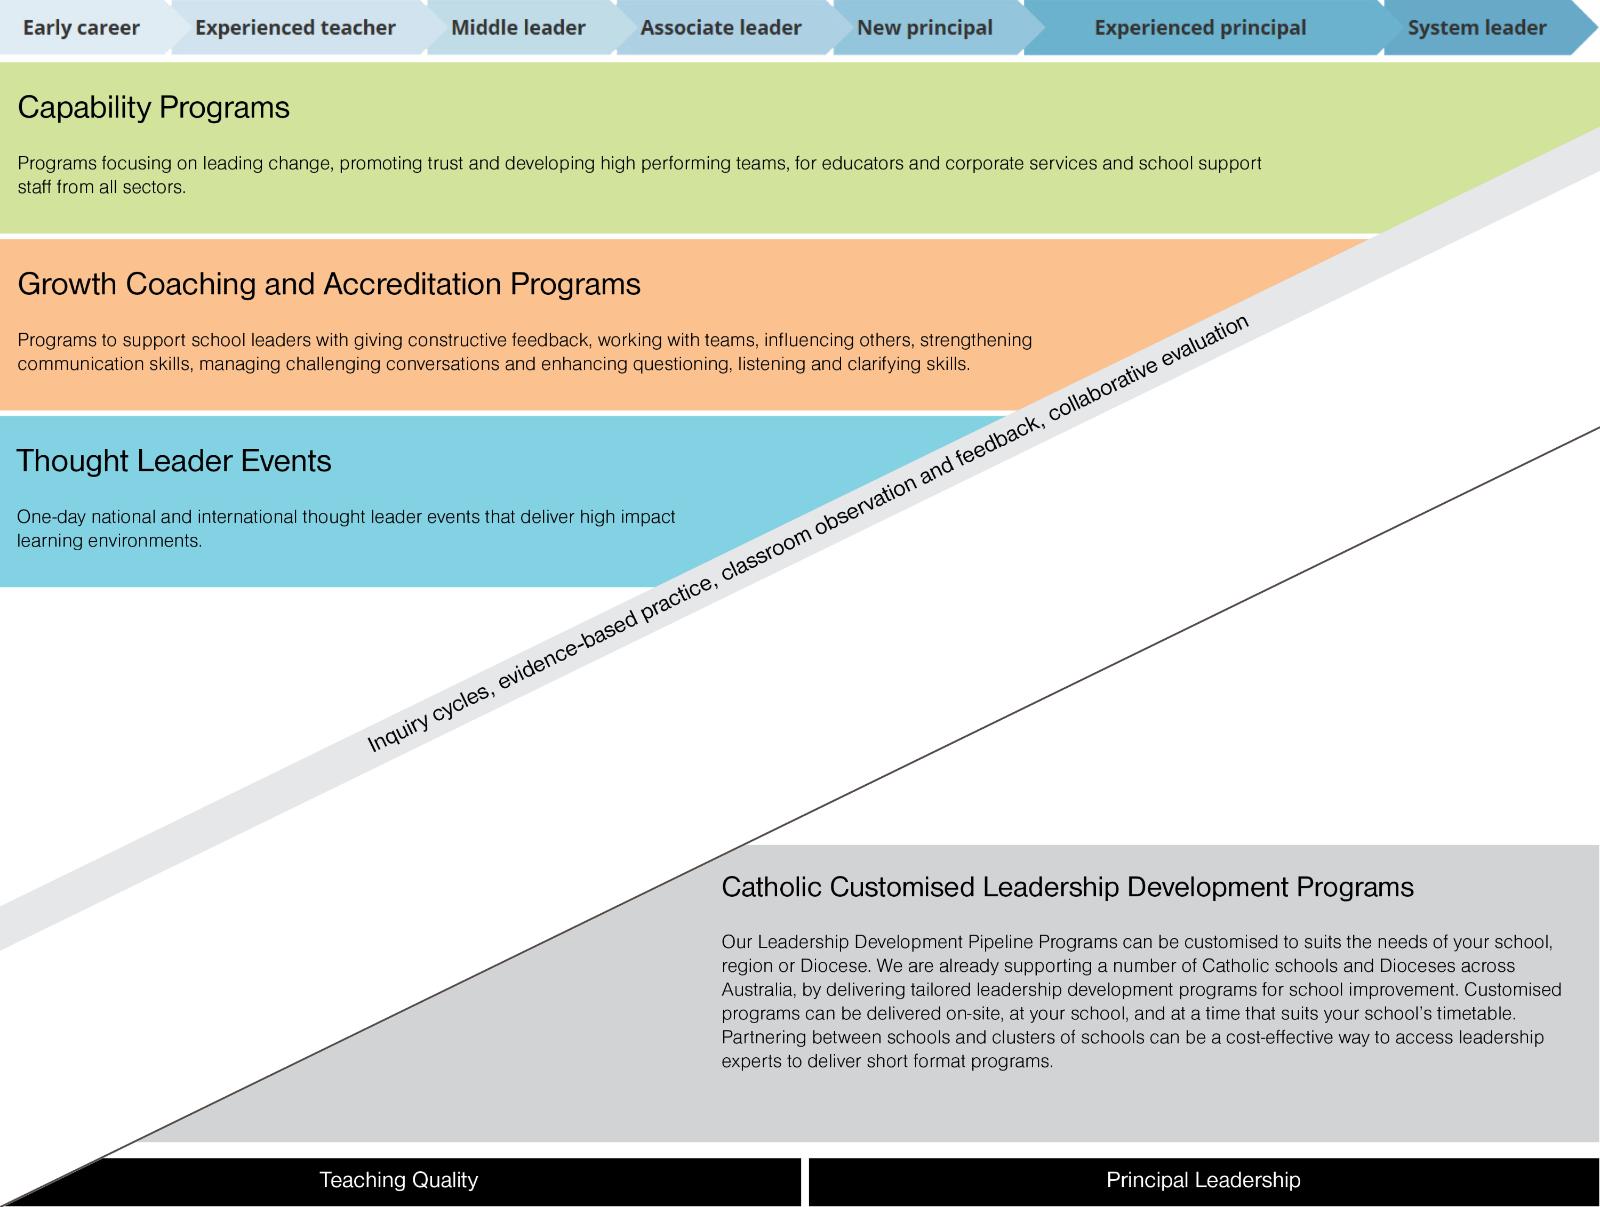 Leadership Development Pipeline